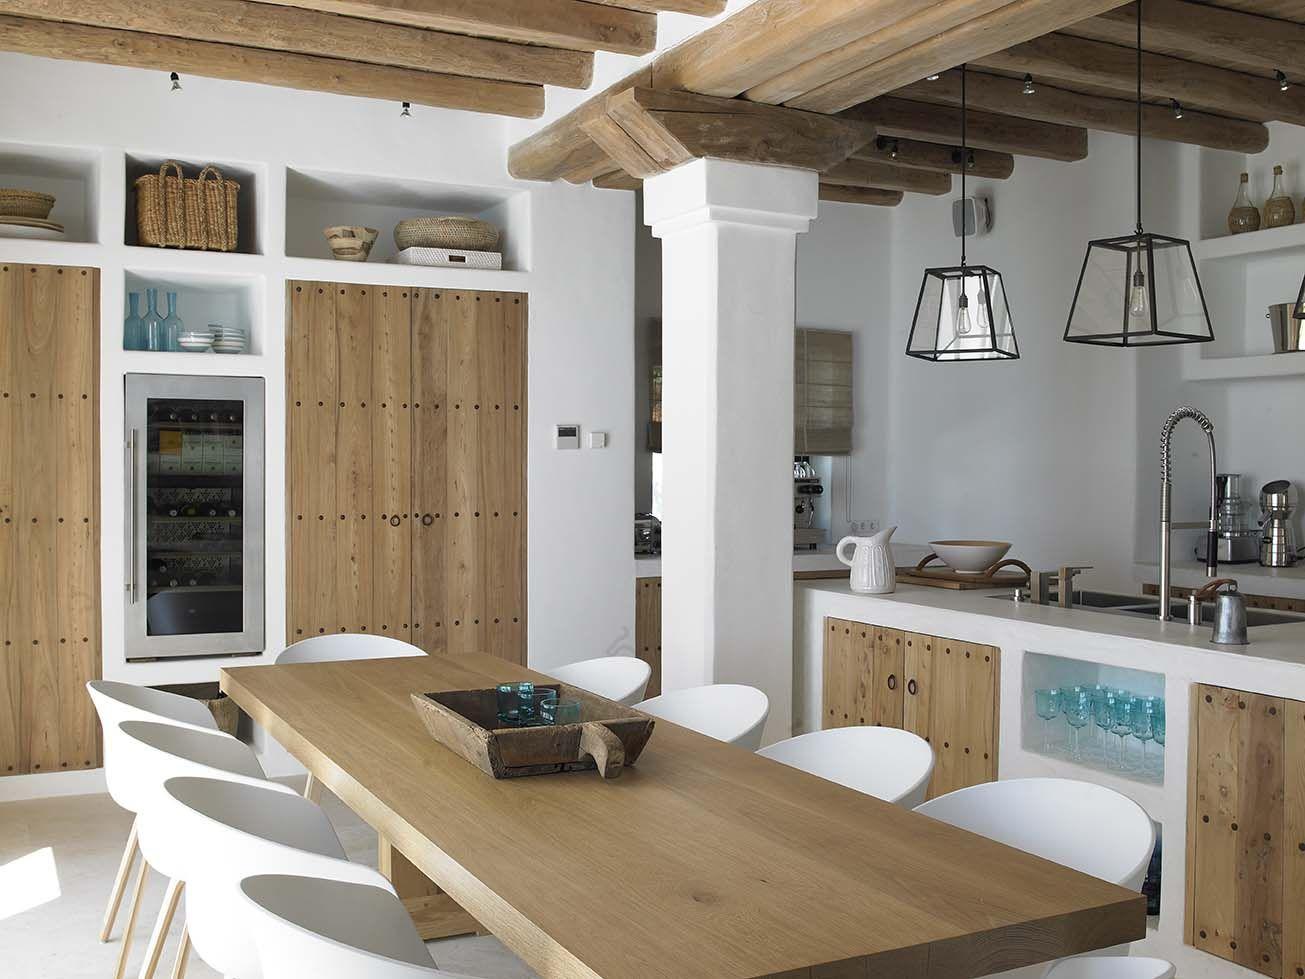 open kitchen facing the pool with glass door design rh pinterest com